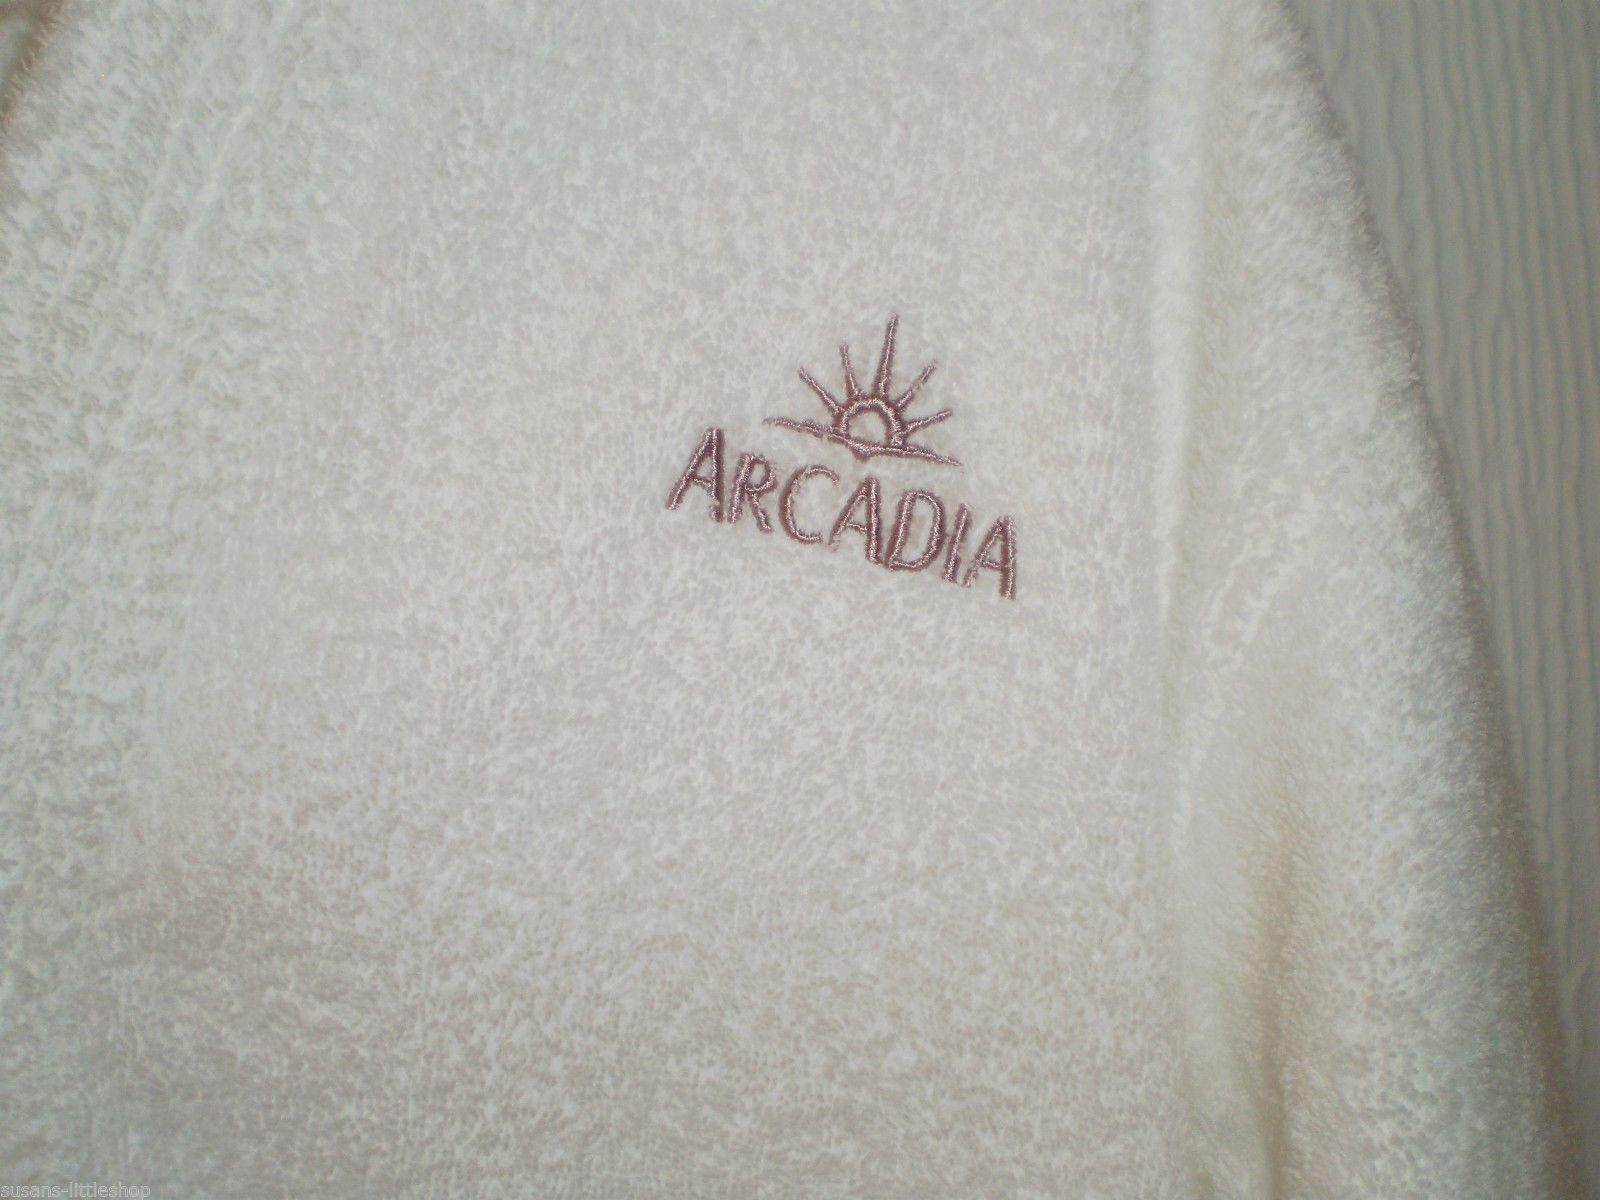 P O Cruises Arcadia Cruise Ship White Bath Robe Dressing Gown One Size  Regular 1ba9b02ff